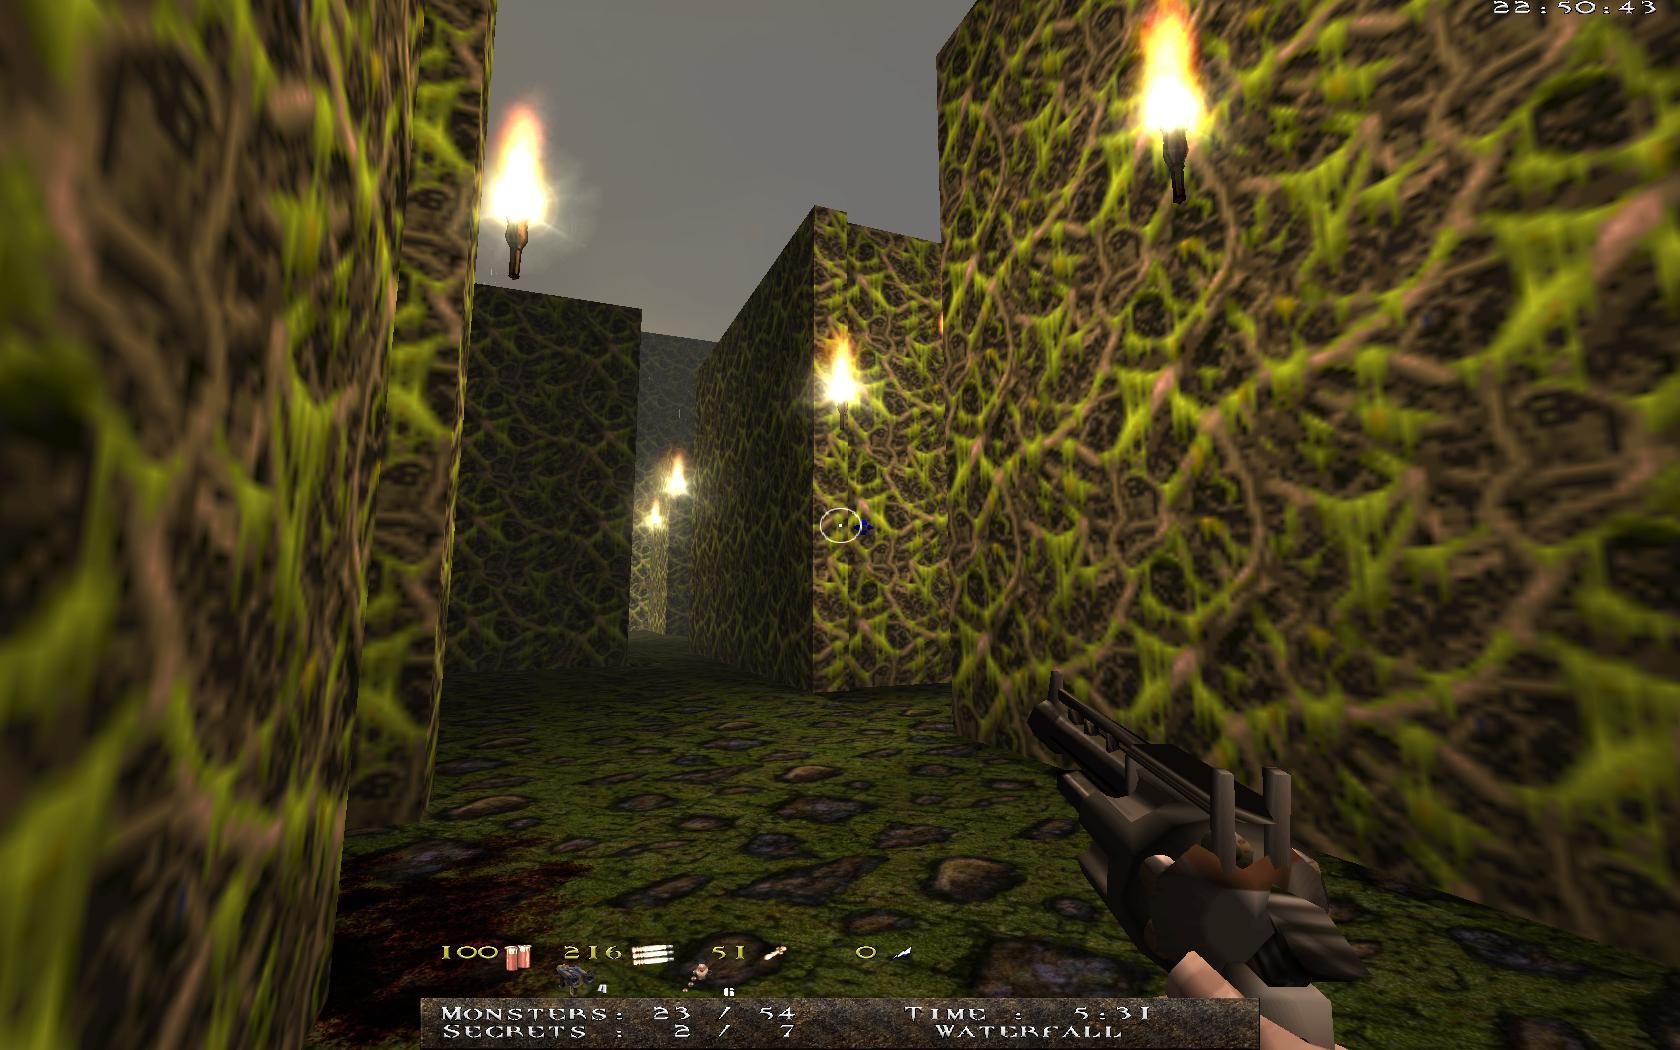 Quake Mountain addon for Quake 1 (qrack port) - лабиринт... огни криво стоят )) - Quake Мод